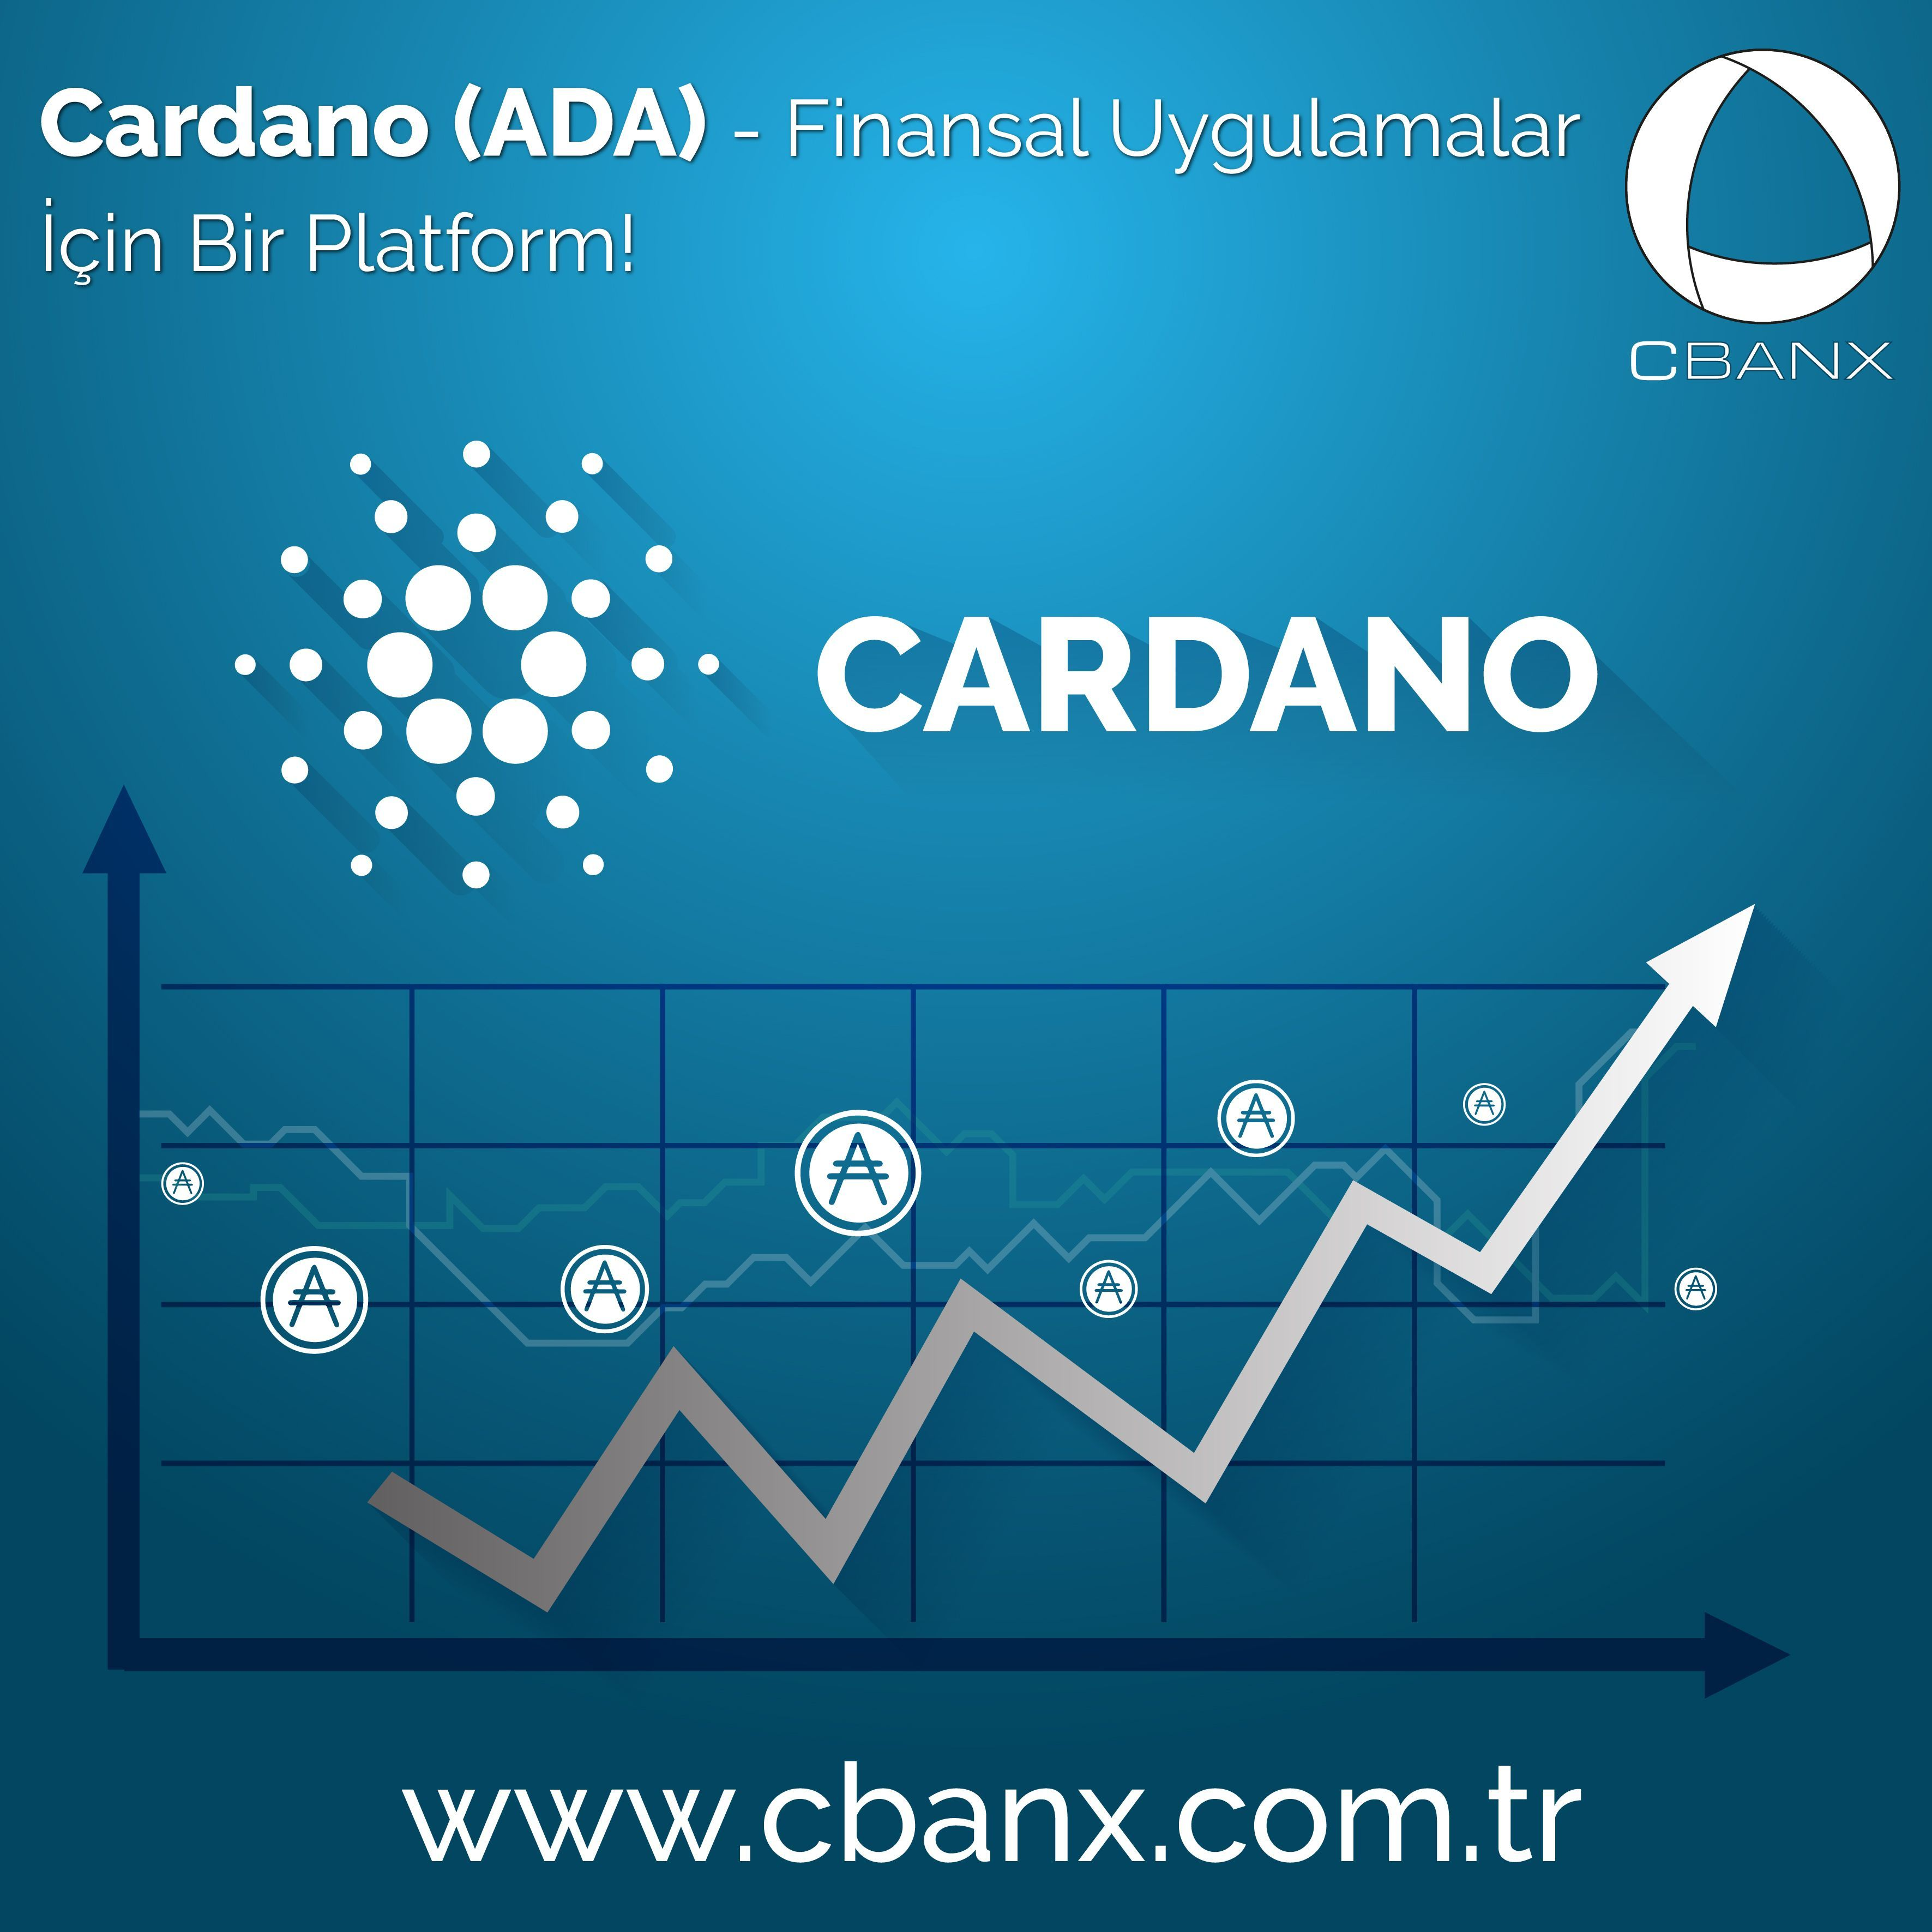 Cardano Ada Diger Blockchain Platformlarindan Farkli Olarak Arastirma Sonucunda Bilimsel Bir Felsefeden Cryptocurrency Cryptocurrency Trading Crypto Market